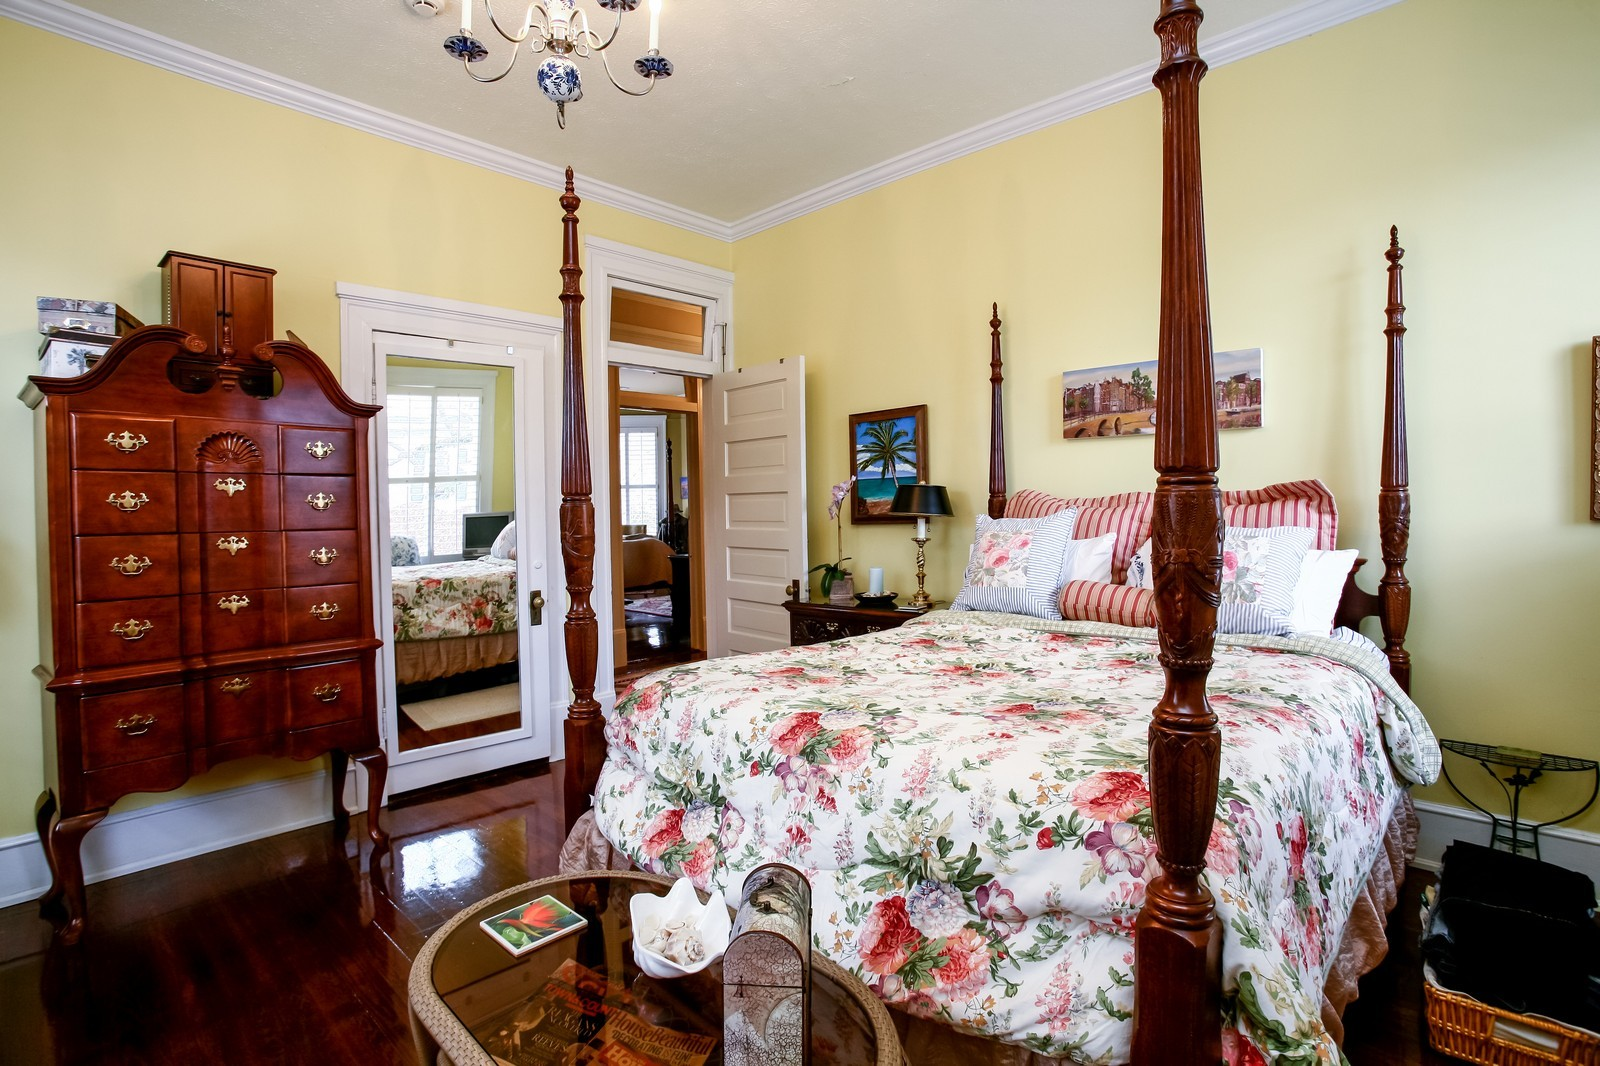 Real Estate Photography - 414 N 14th St, Lanett, AL, 36863 - 3rd Bedroom